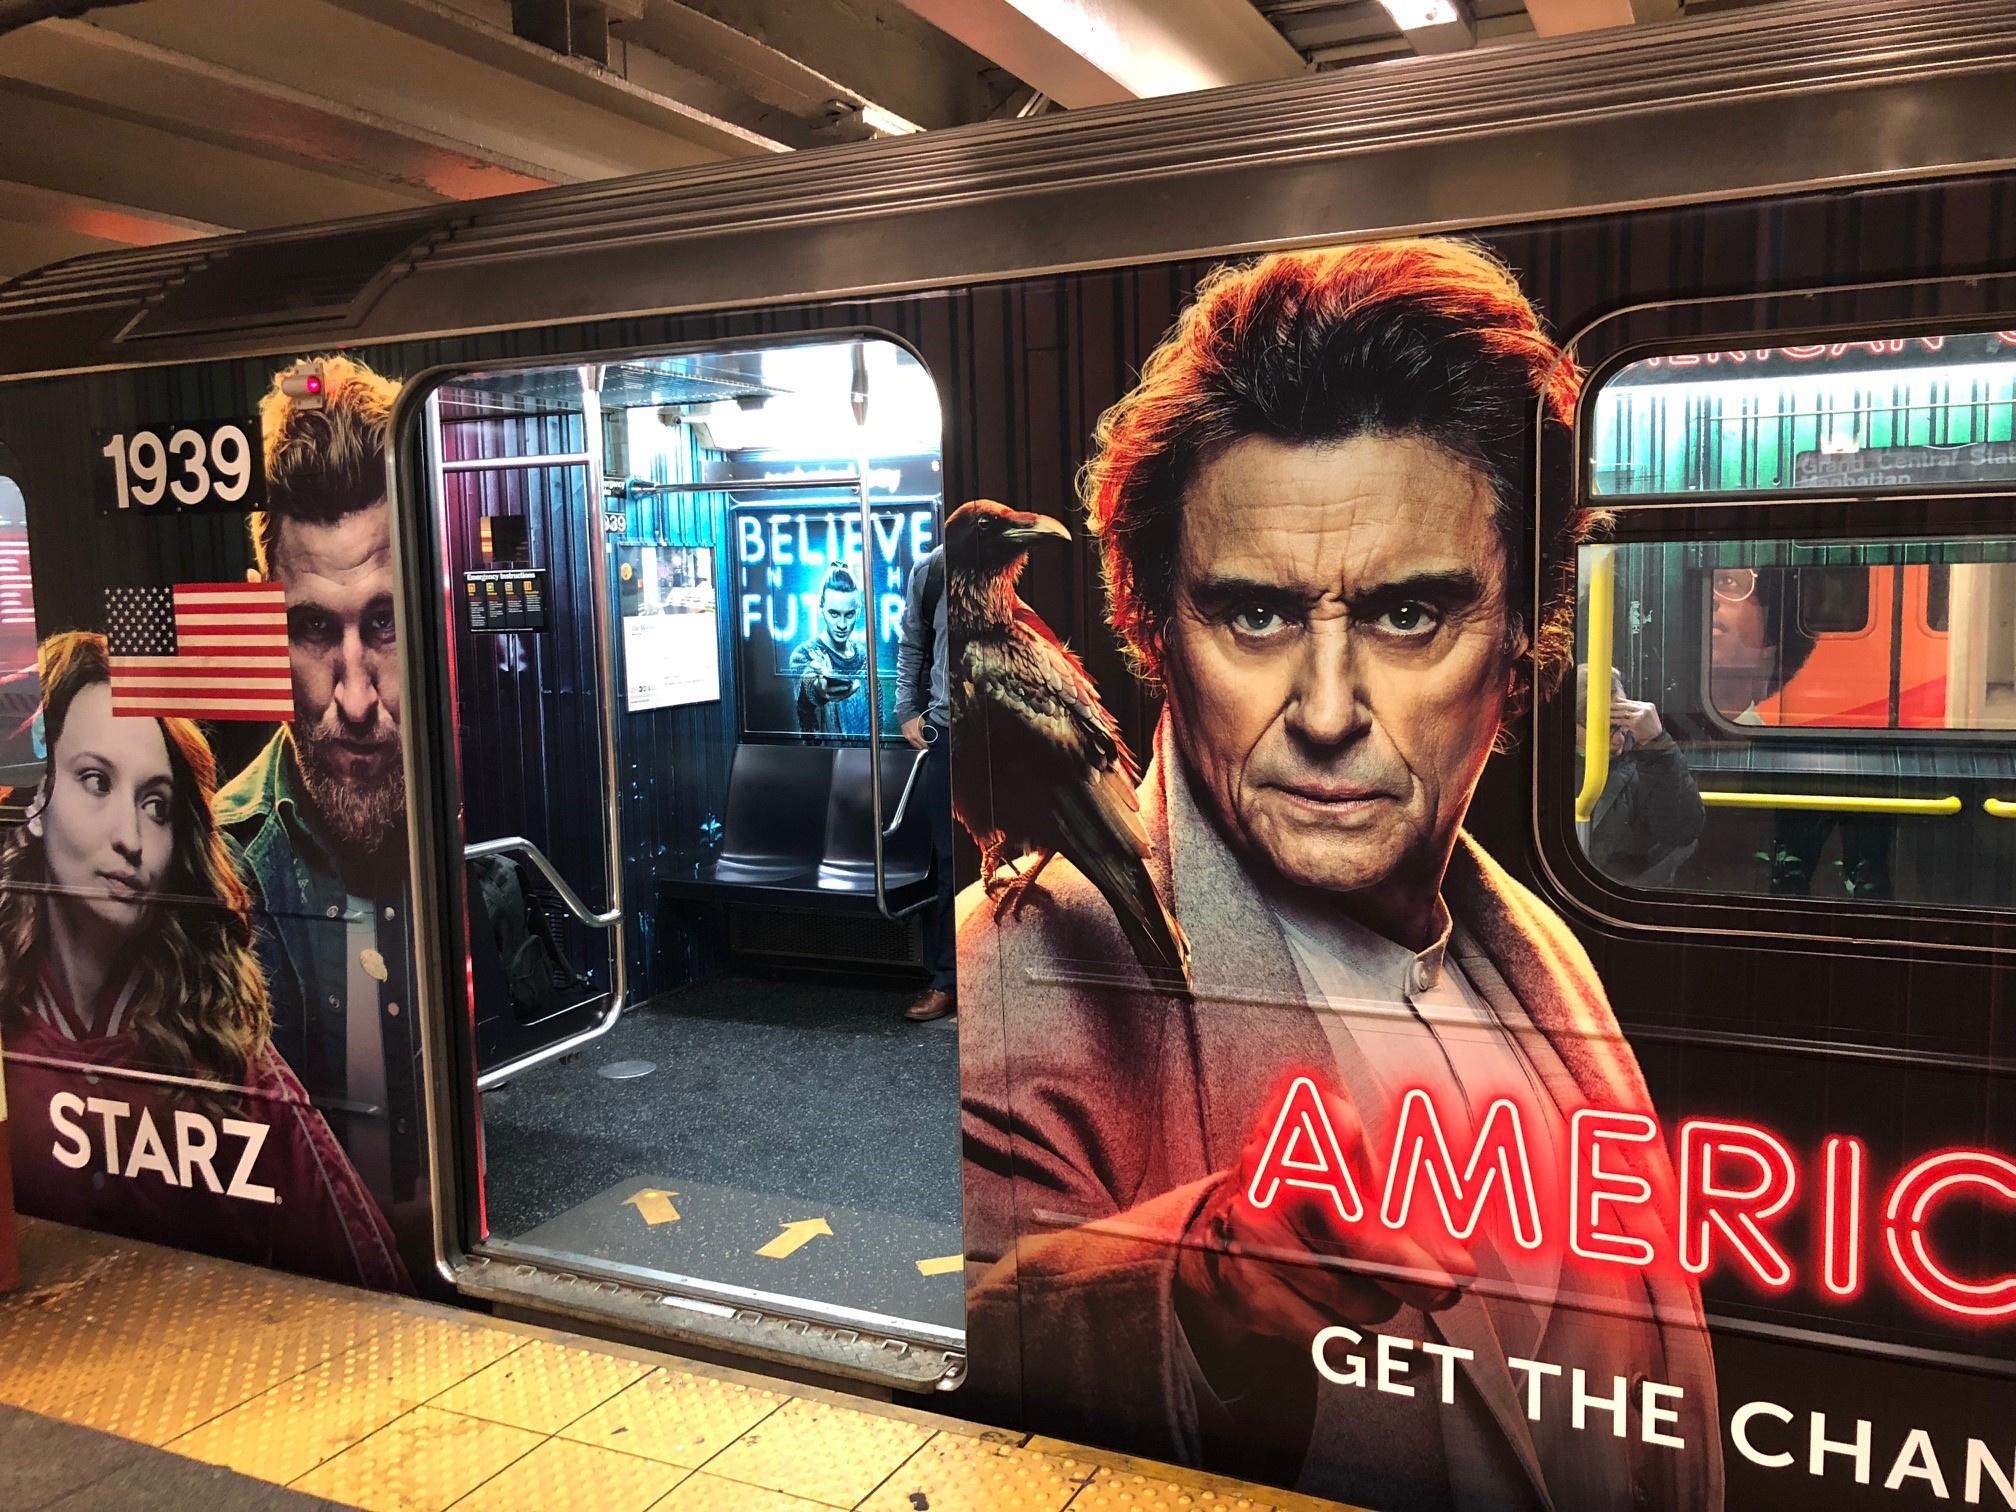 Thumbnail for American Gods S2 OOH (Subway Wrap)